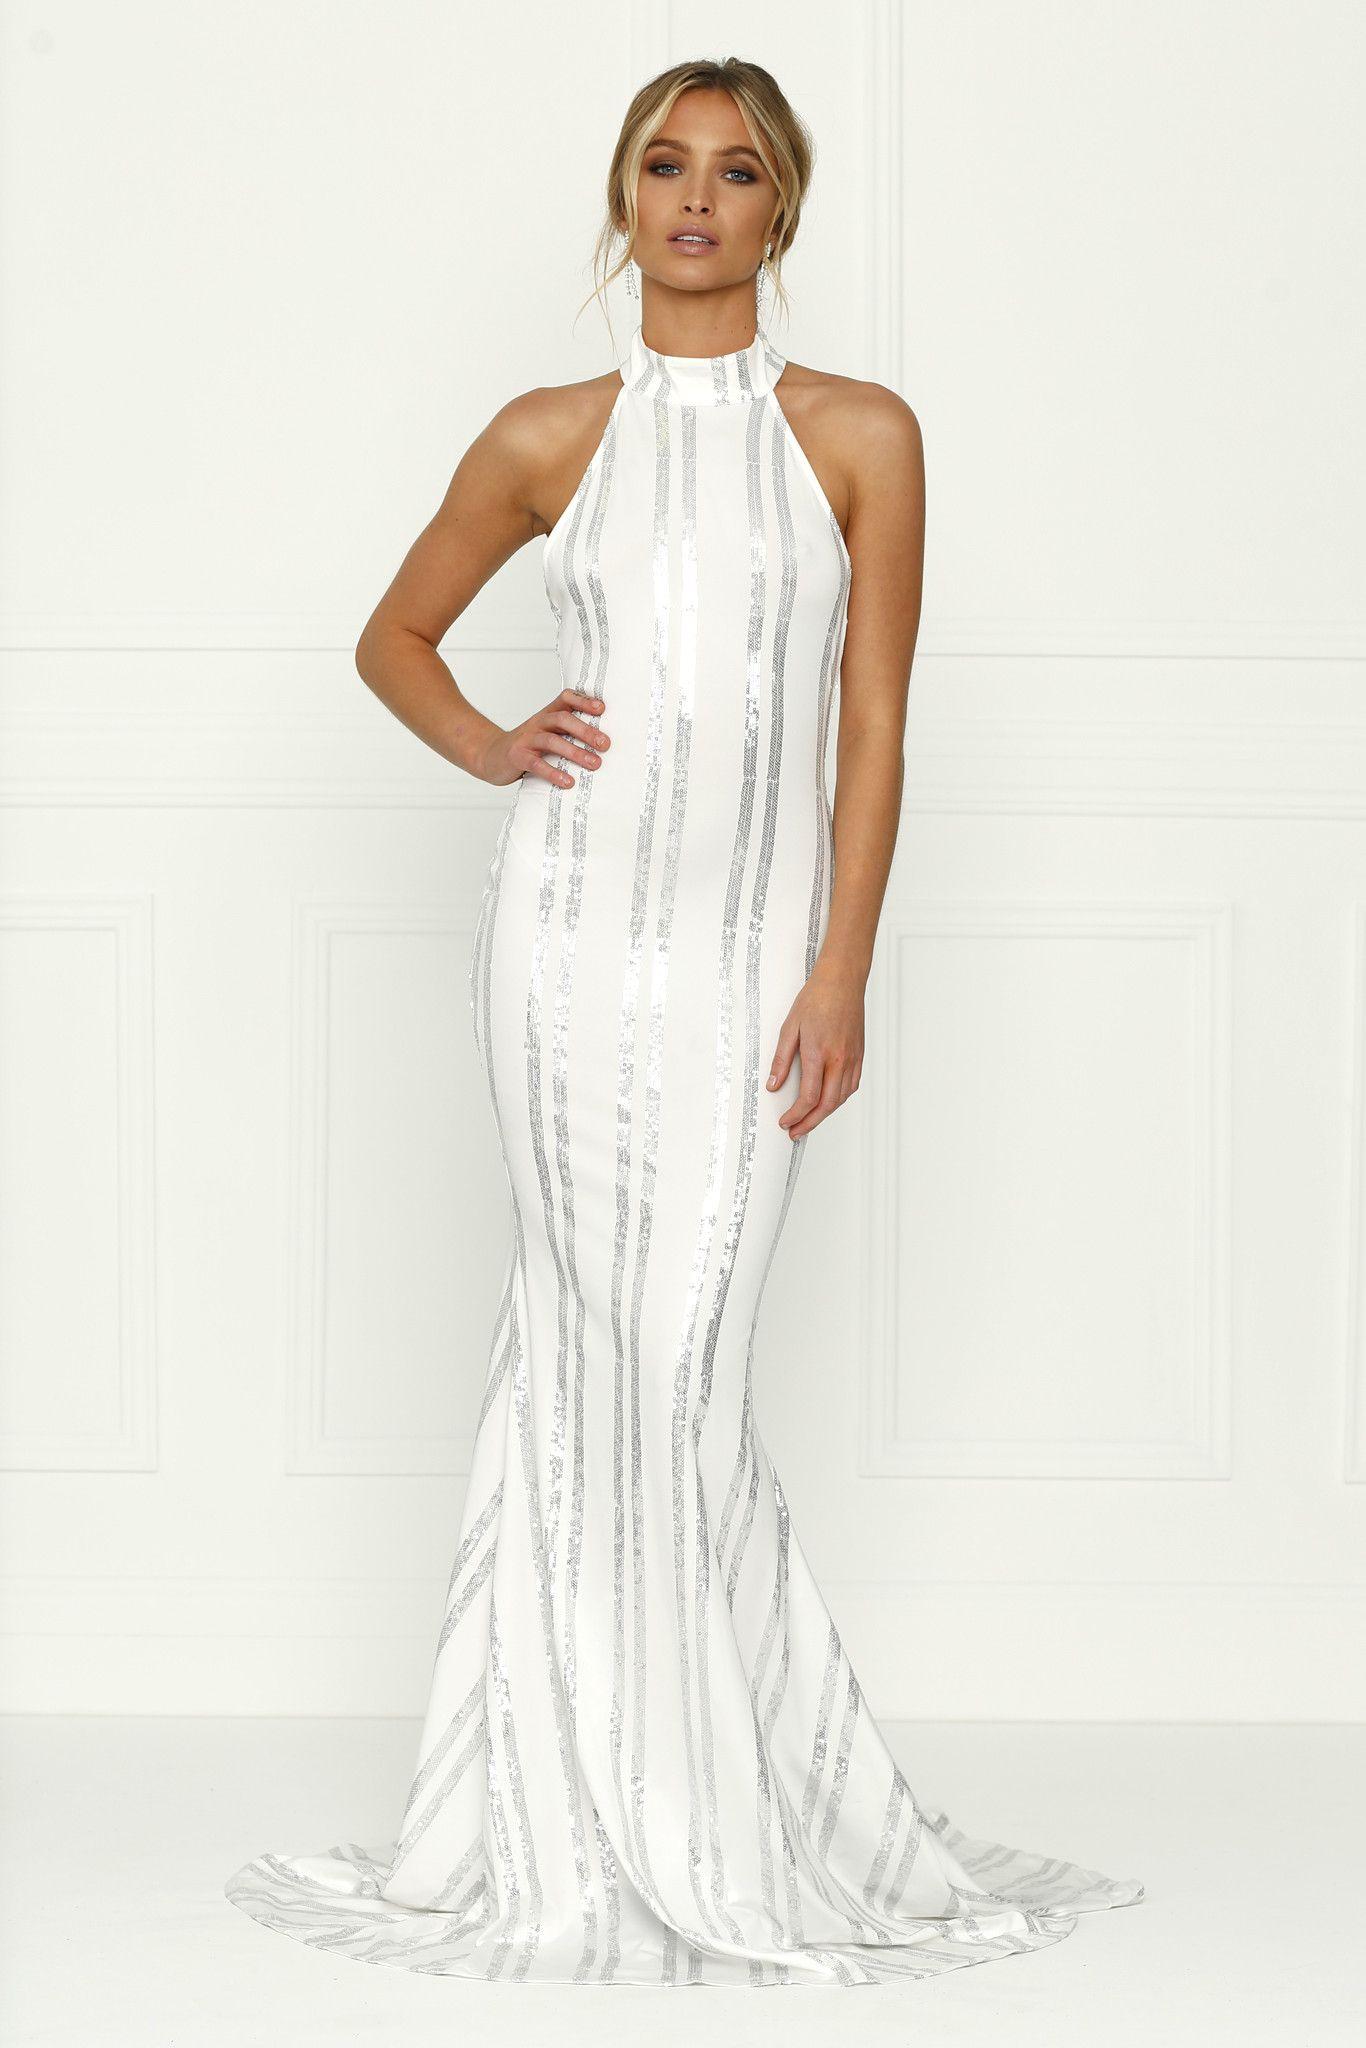 SARA Sequin White Mermaid Halter Gown Dress  Gown dress Gowns ...